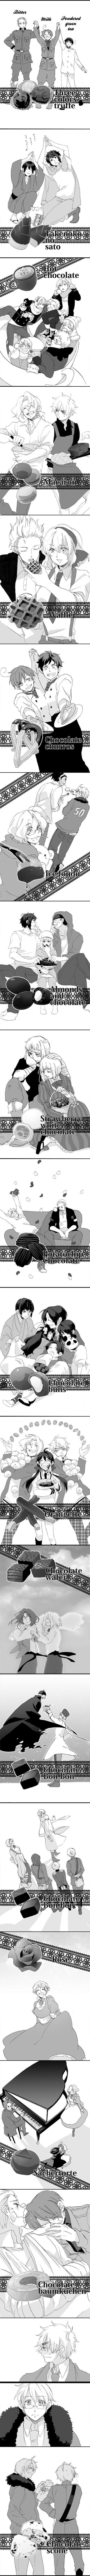 Tags: Anime, Runko, Axis Powers: Hetalia, Sweden, Japan, Iceland, Estonia, Sealand, Poland, France, Egypt, Latvia, Denmark